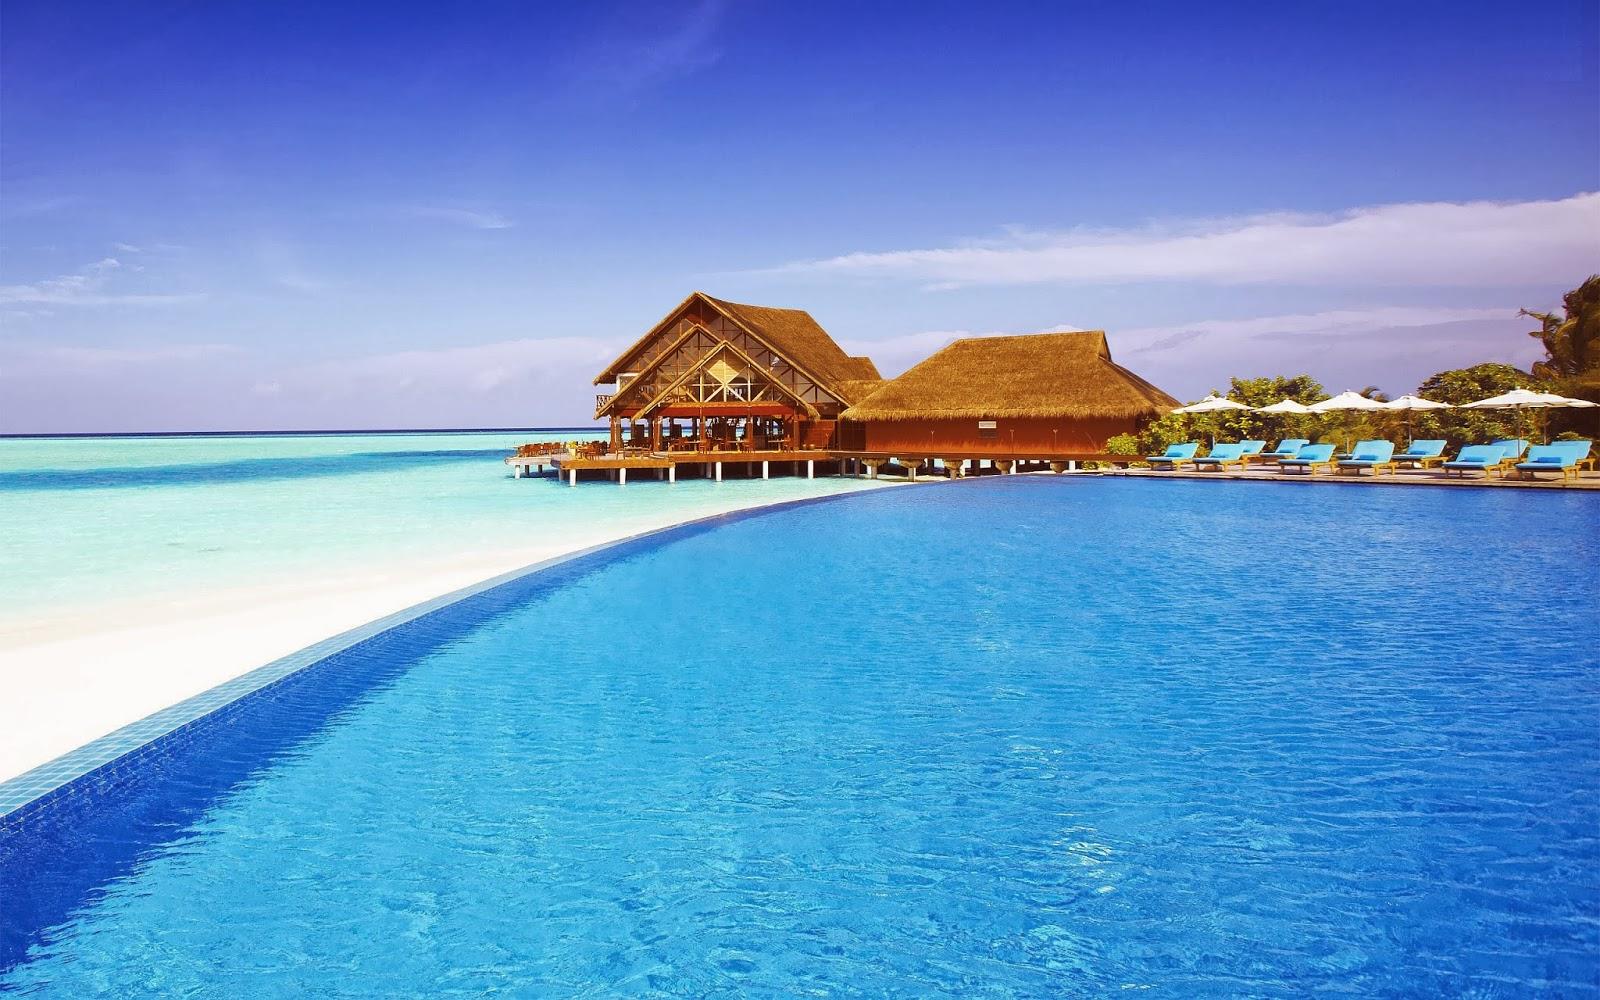 HD Maldives Sun Island Beach Wallpapers - Wallpapers Free